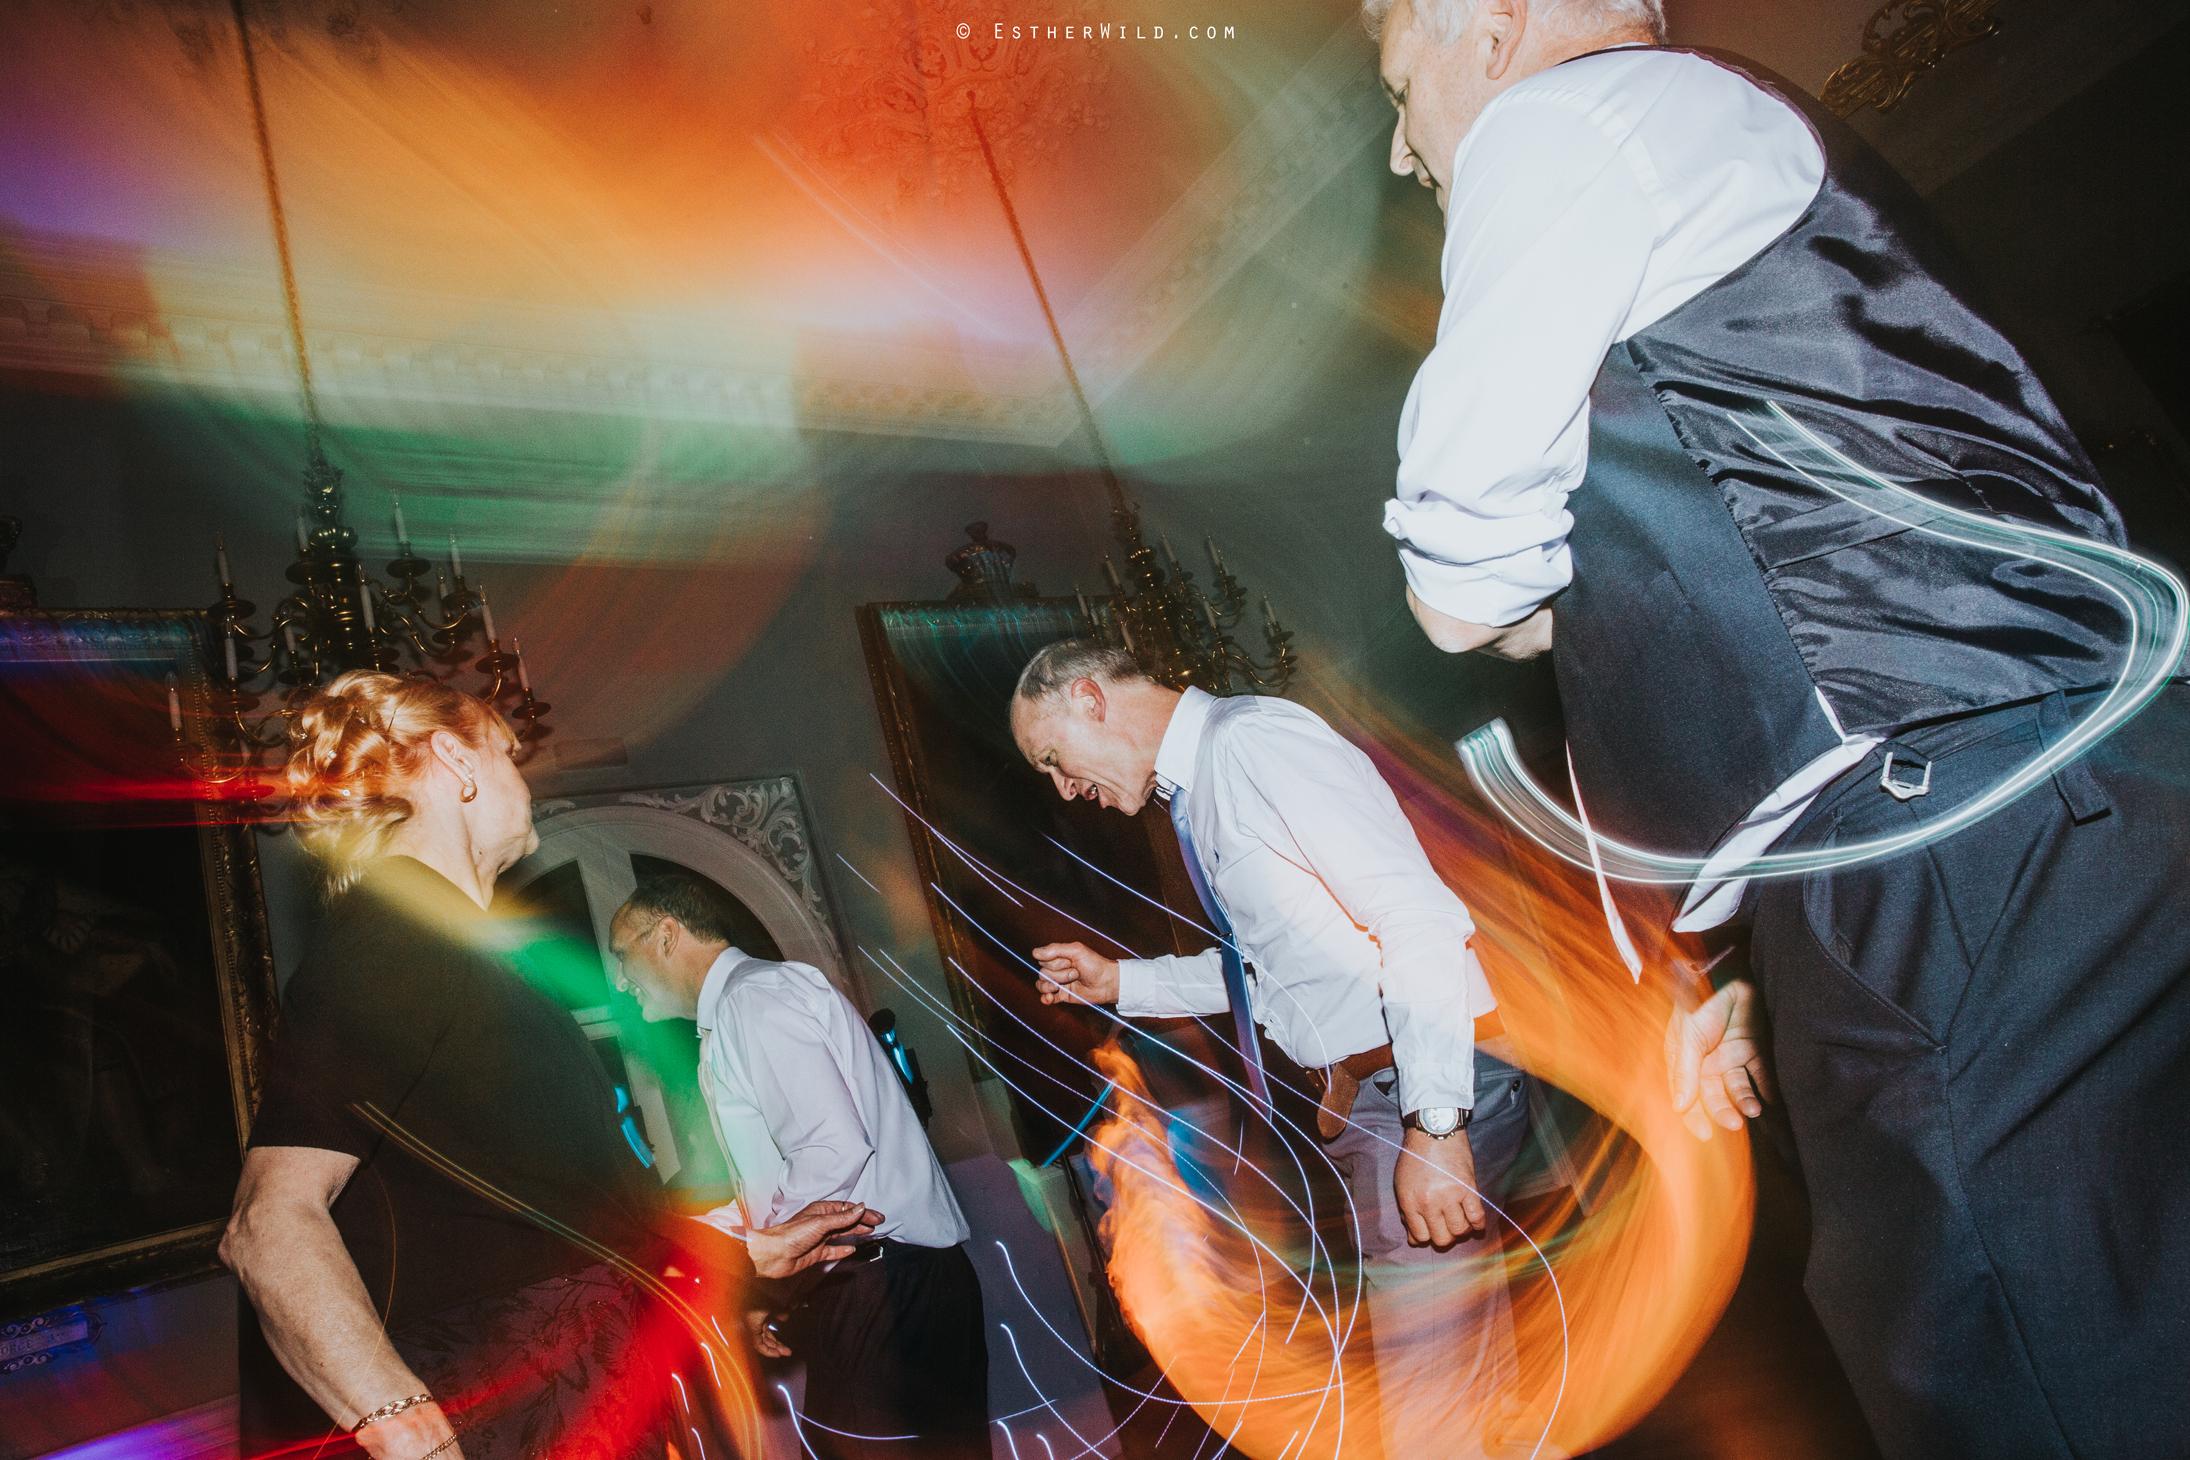 Wedding_Kings_Lynn_Town_Hall_Norfolk_Photographer_Esther_Wild_IMGL0926.jpg